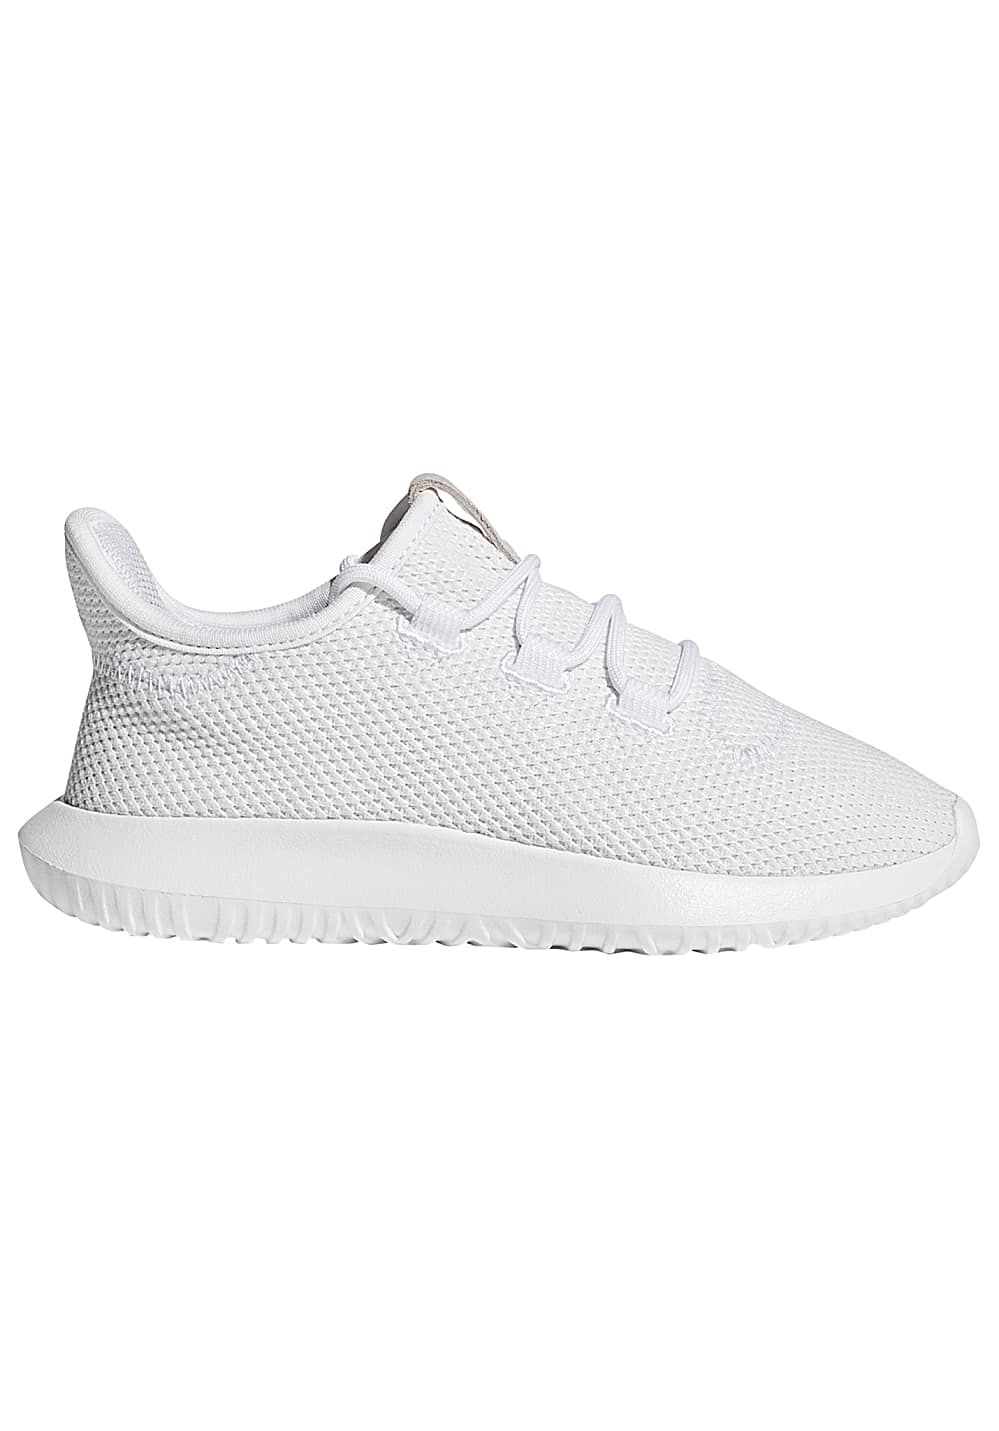 clearance adidas tubular runner baskets blanc ec927 5fbee